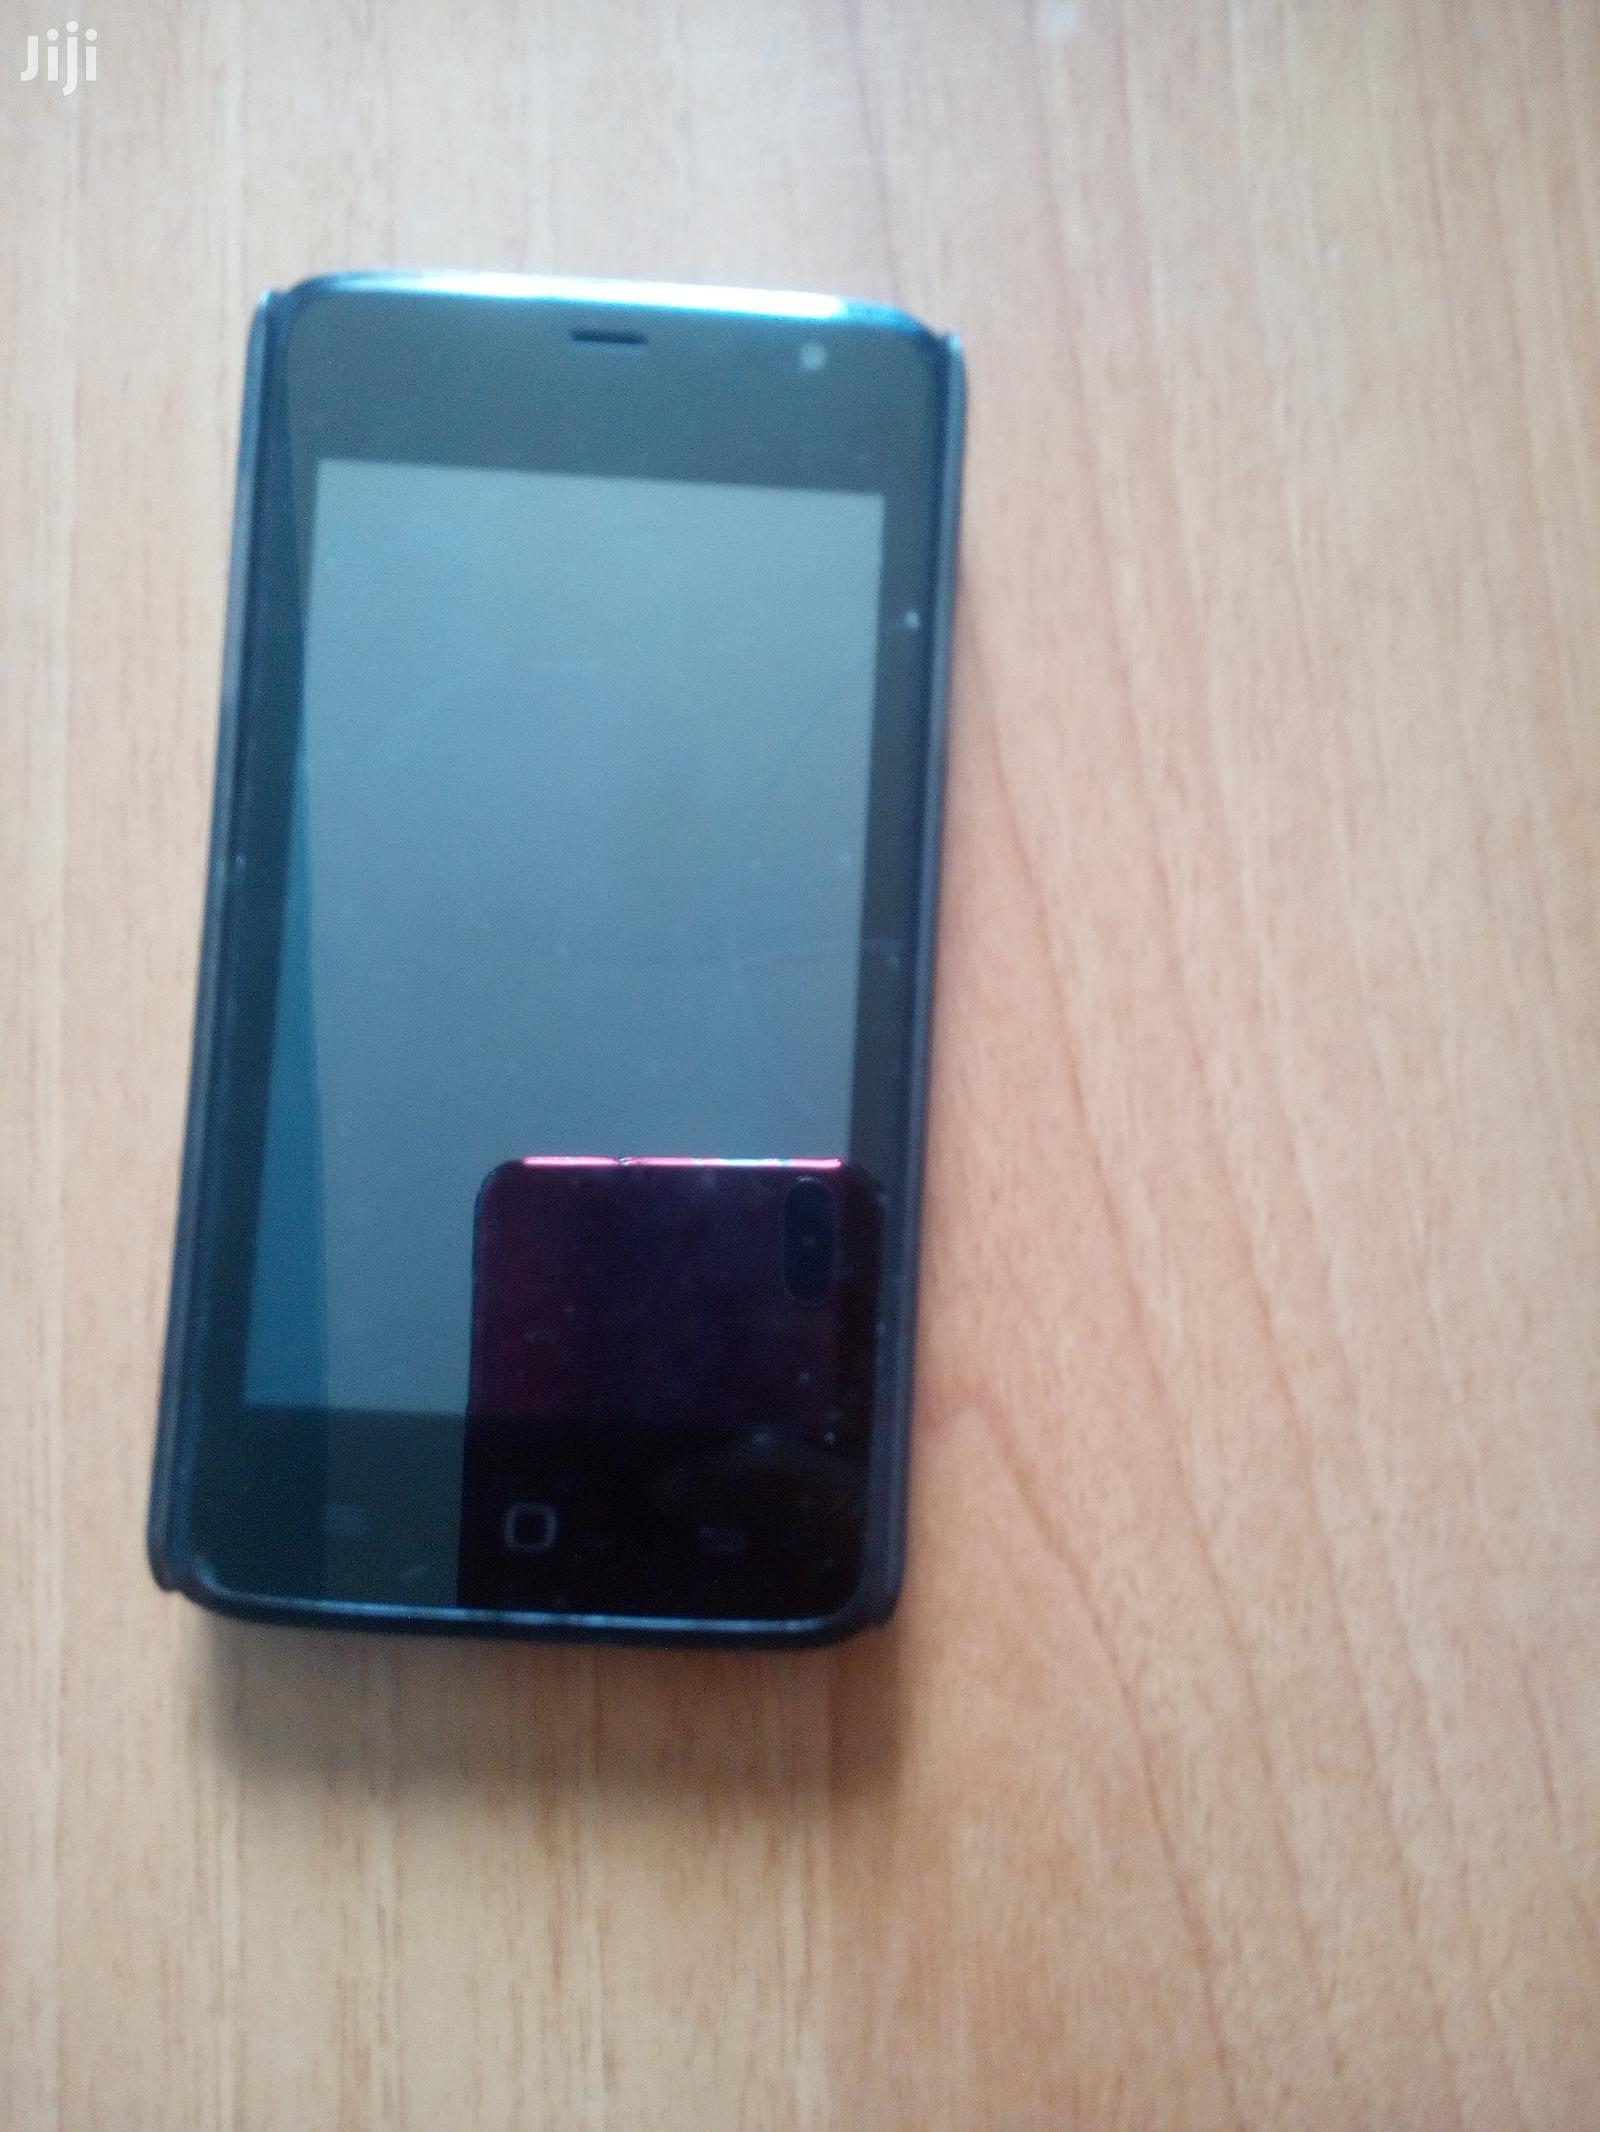 Archive: Tecno Y3 8 GB Black